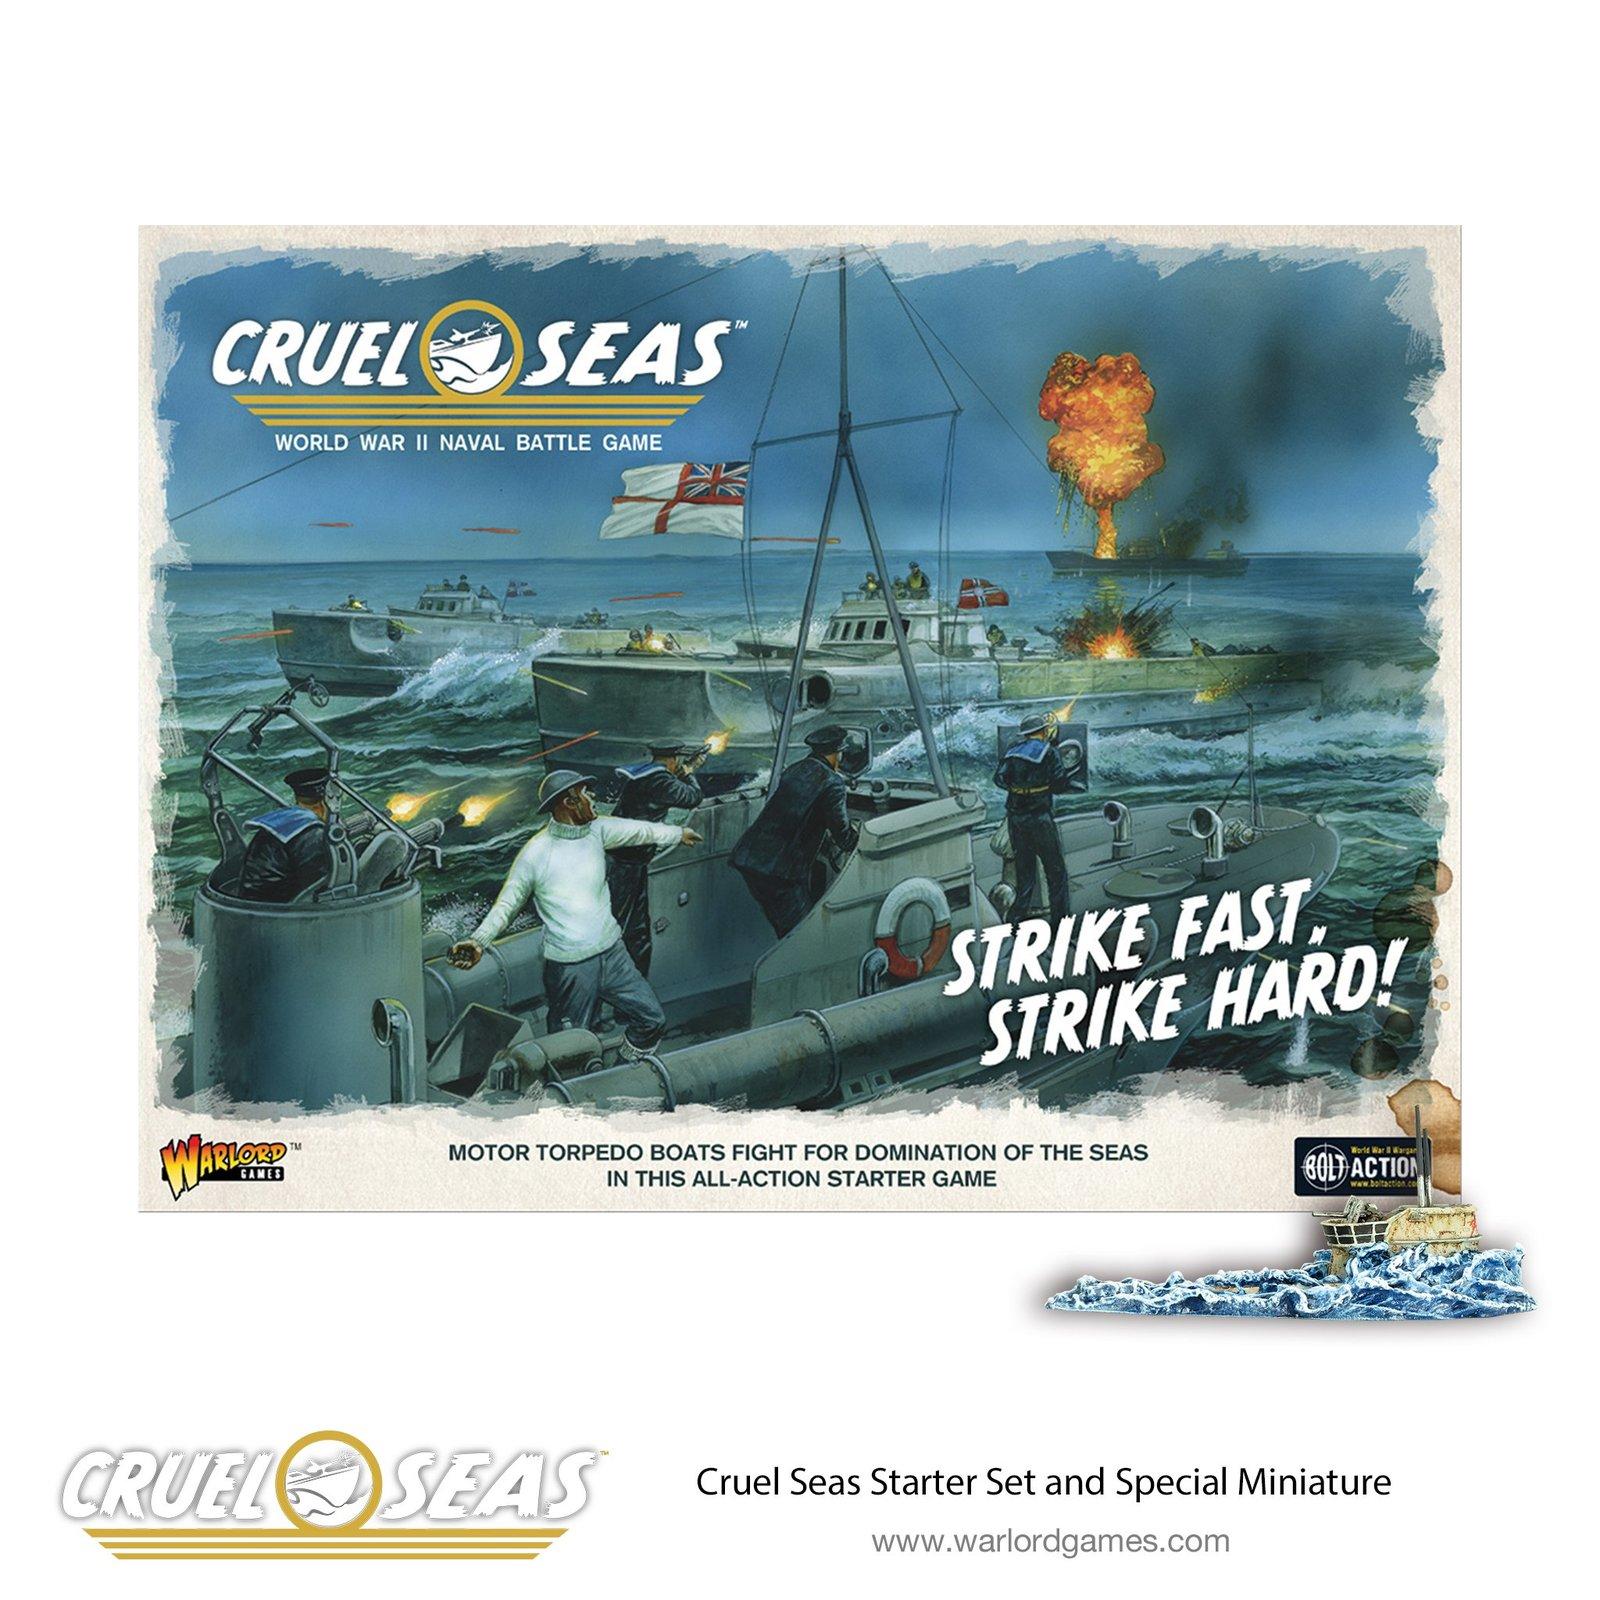 Cruel Seas Starter Set image